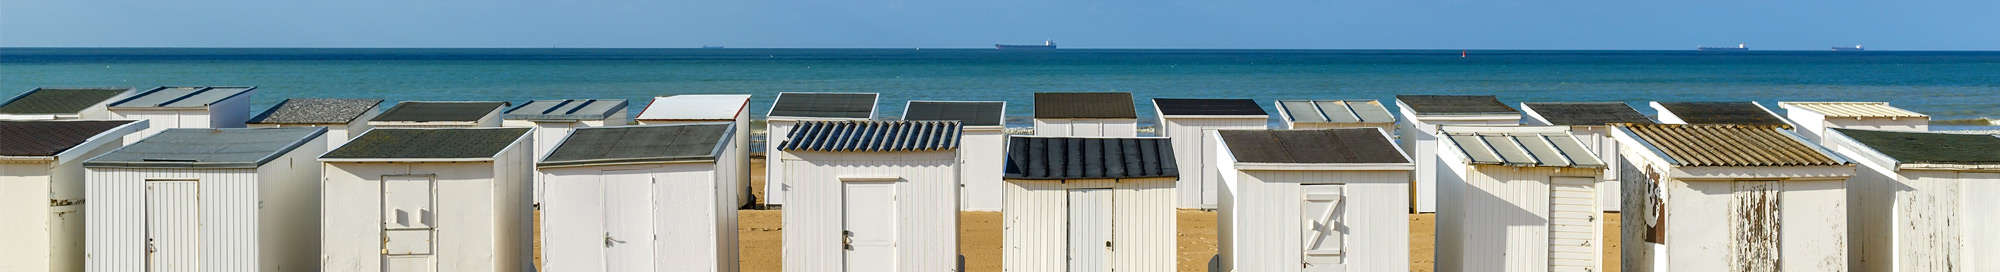 Week-end A la mer à Calais